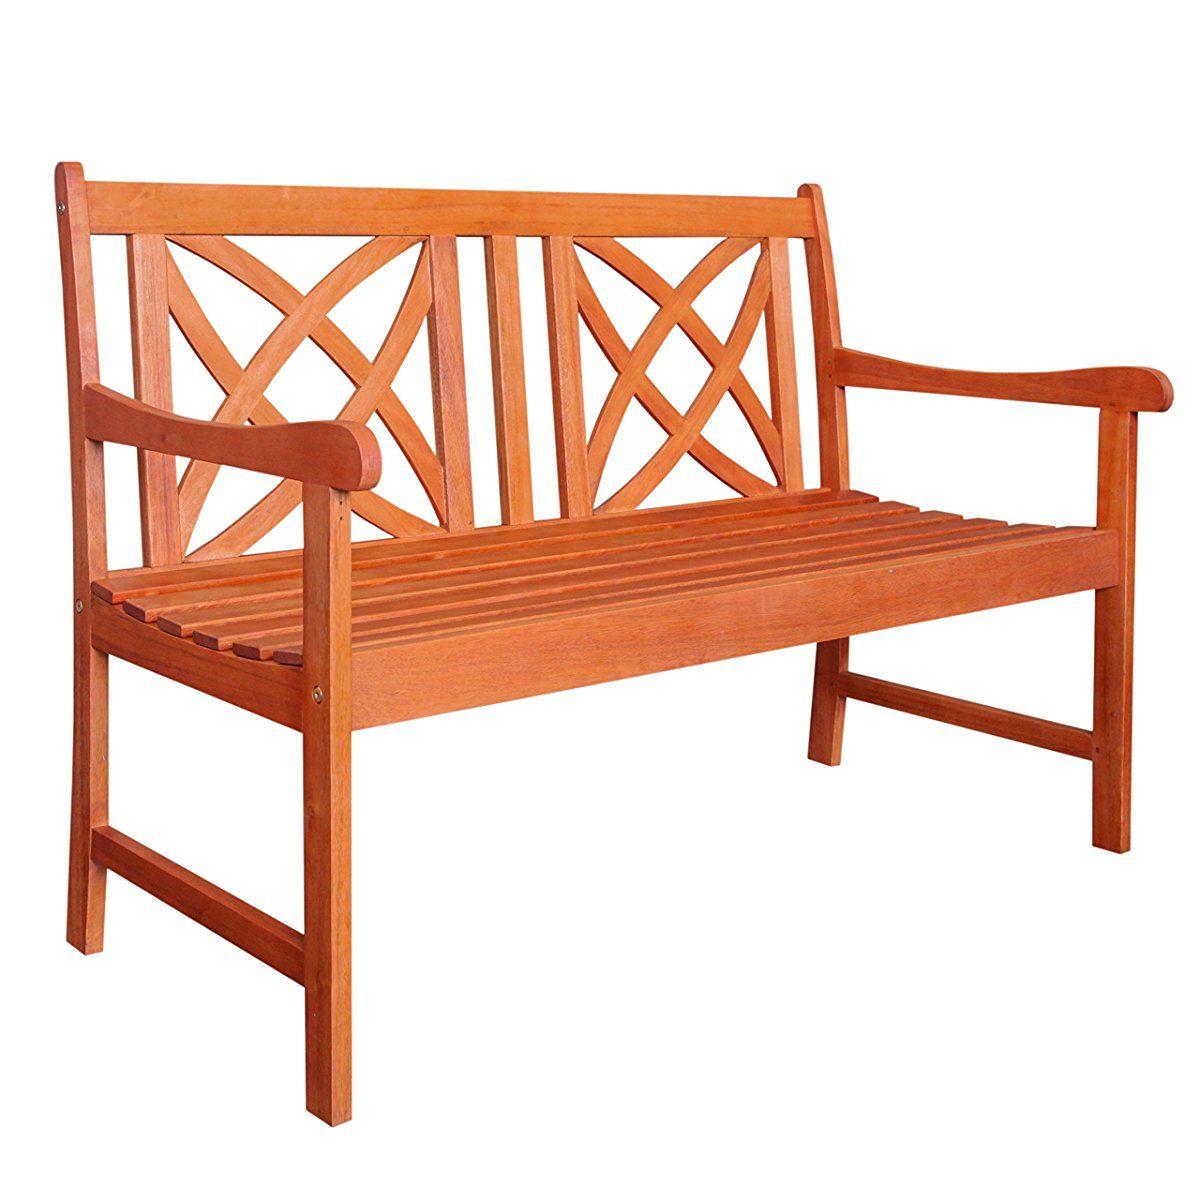 Vifah V1493 Outdoor Wood Garden Bench, 4 Feet | Wooden Regarding Alfon Wood Garden Benches (View 7 of 25)